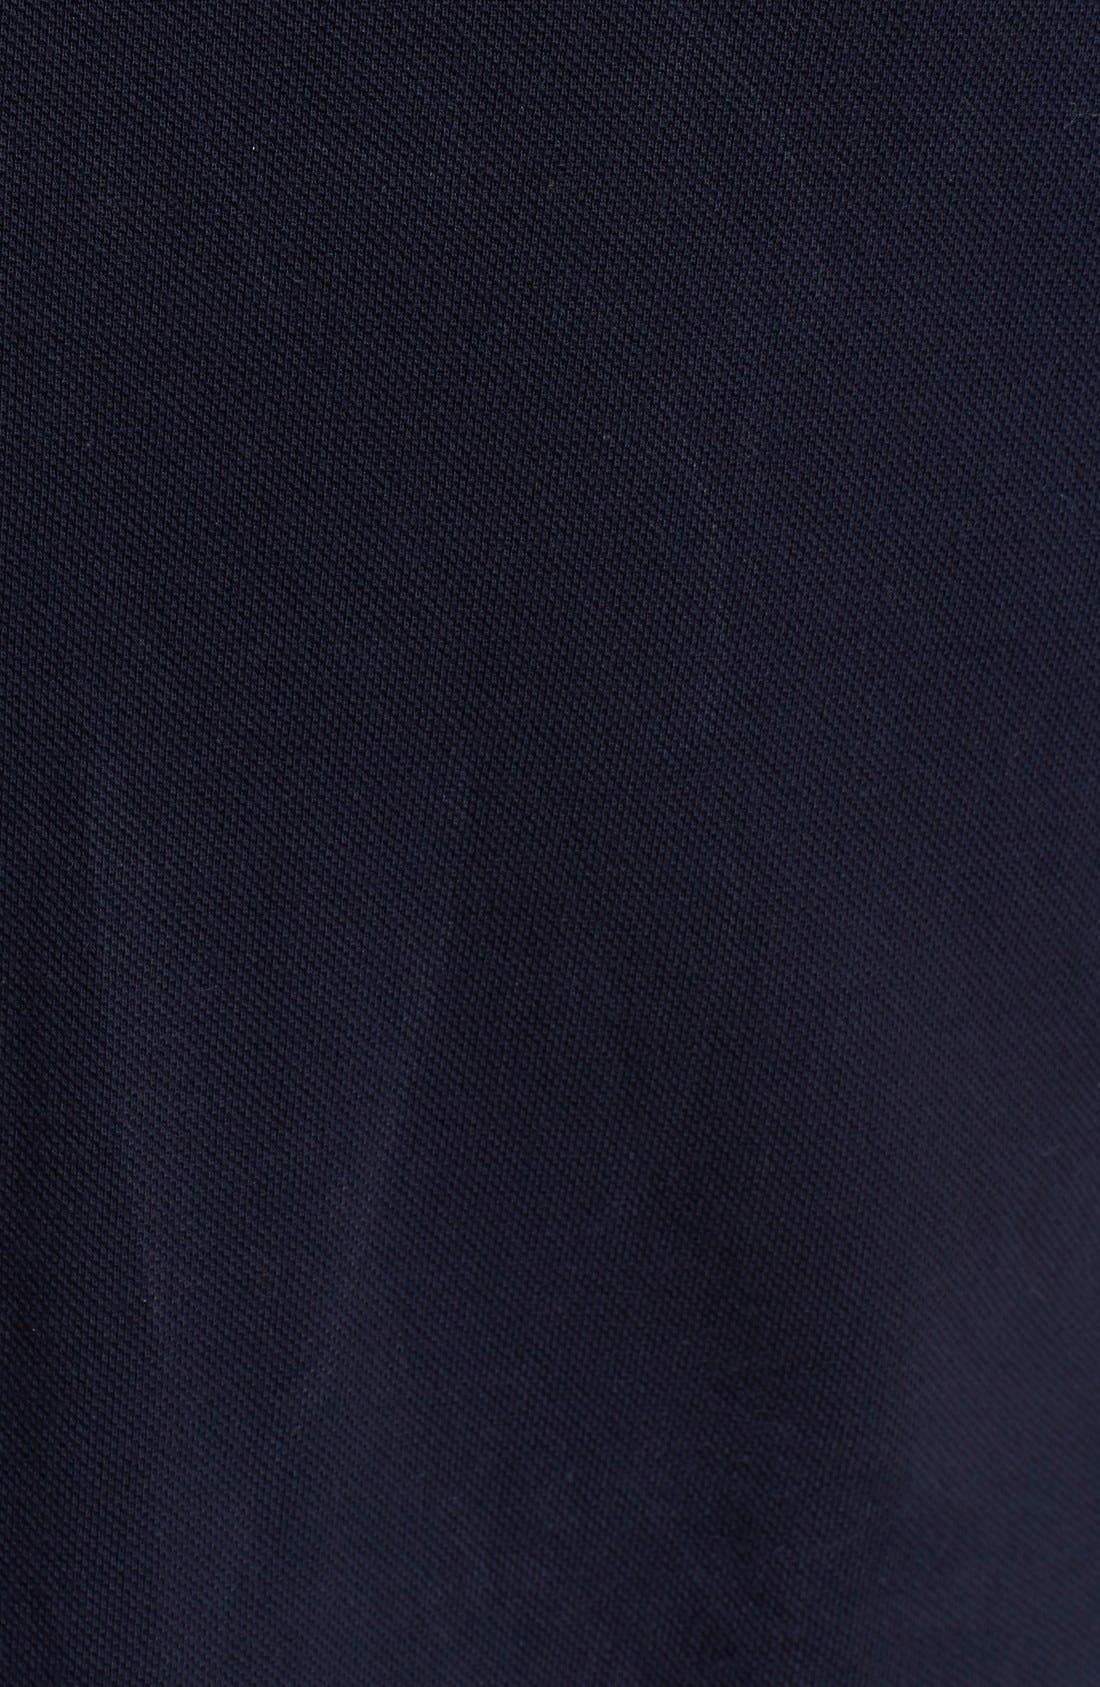 COMME DES GARÇONS, PLAY Piqué Polo with Small Heart Appliqué, Alternate thumbnail 3, color, 421